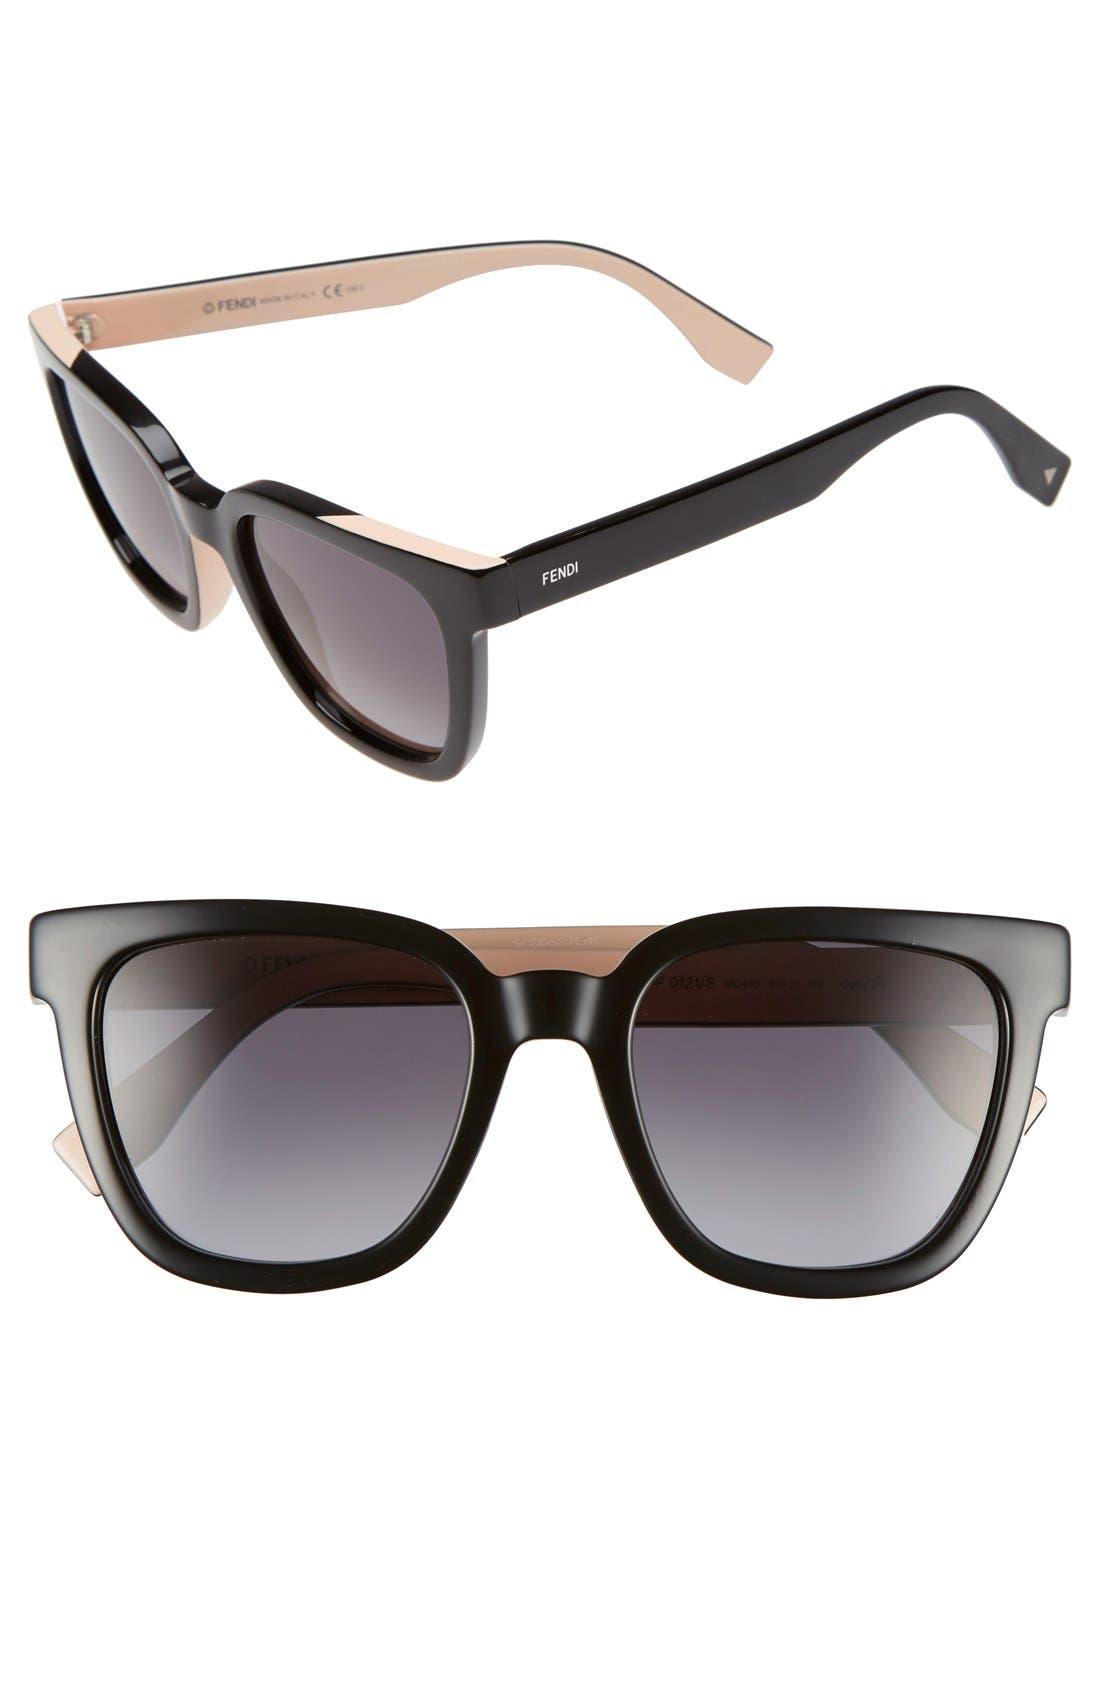 Main Image - Fendi 51mm Sunglasses